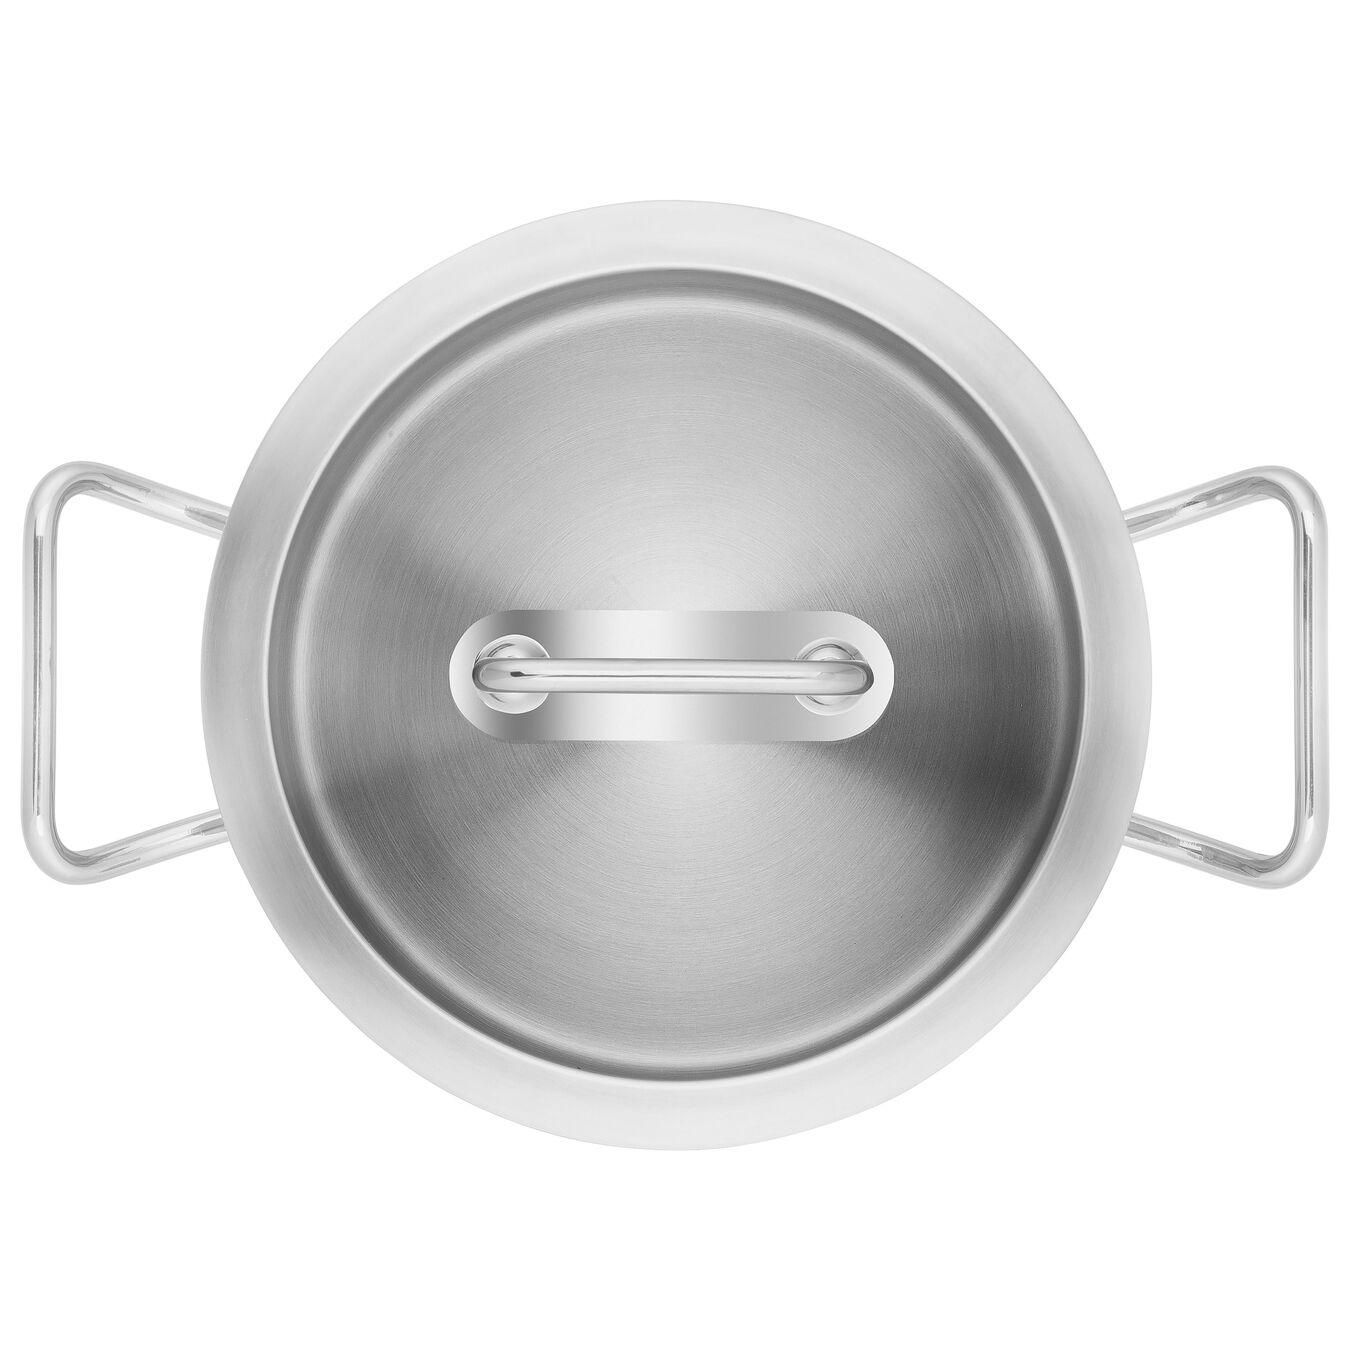 Tencere Seti | 18/10 Paslanmaz Çelik | 5-adet,,large 5